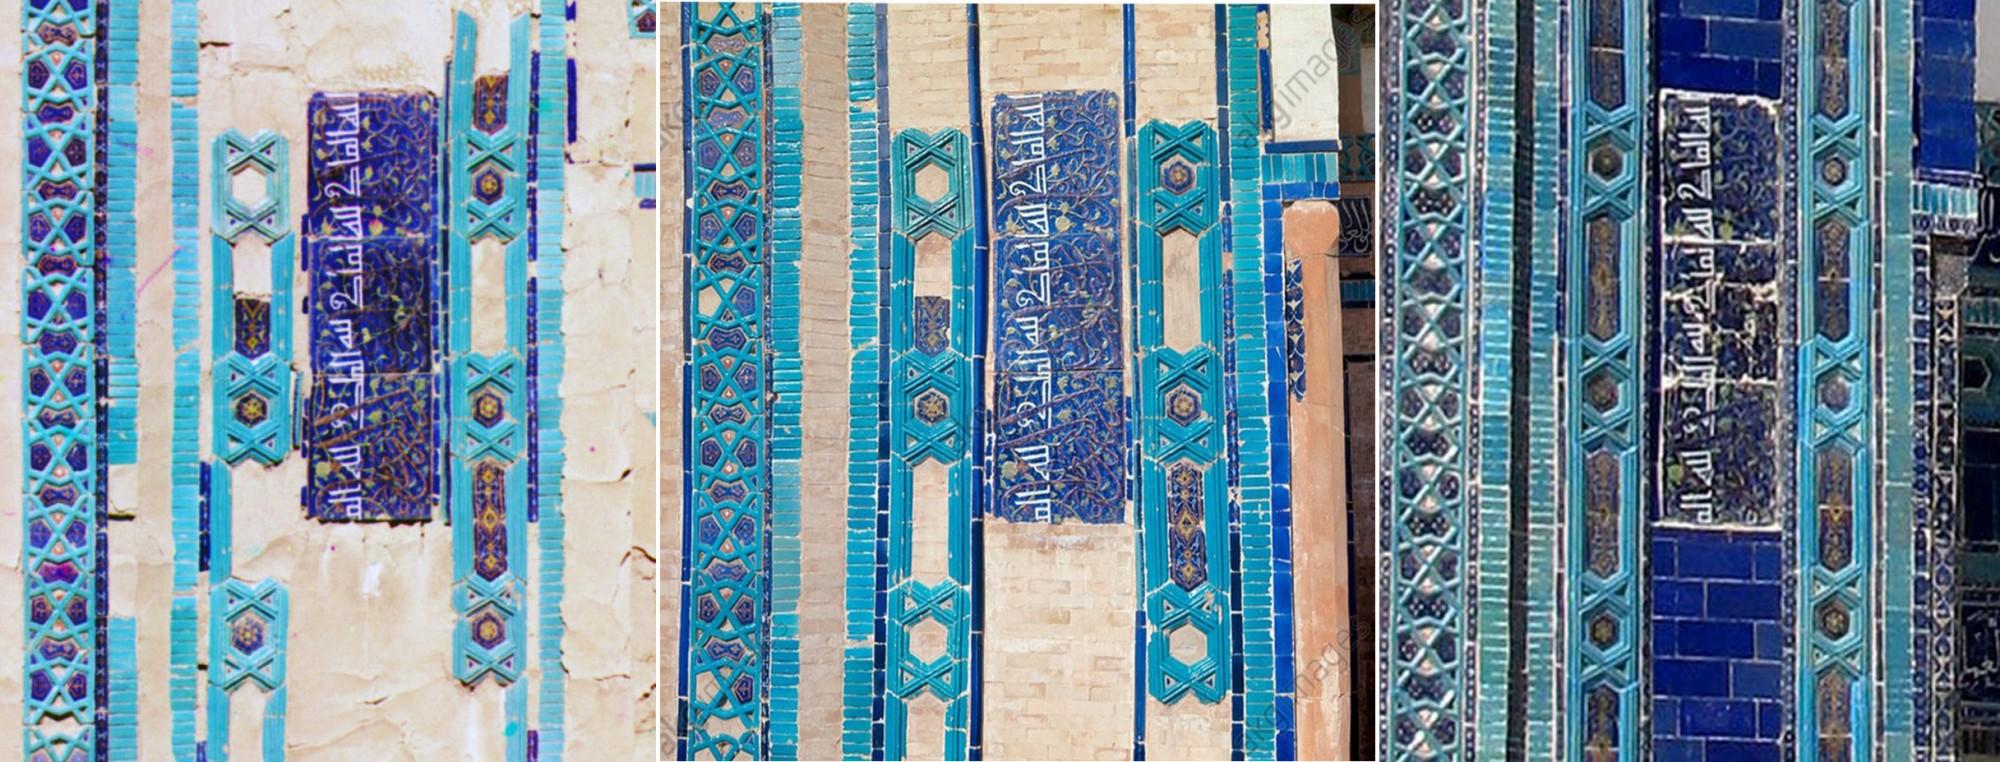 Самарканд. Безымынный мавзолей в некрополе Шахи-Зинде 1911-1973-2018